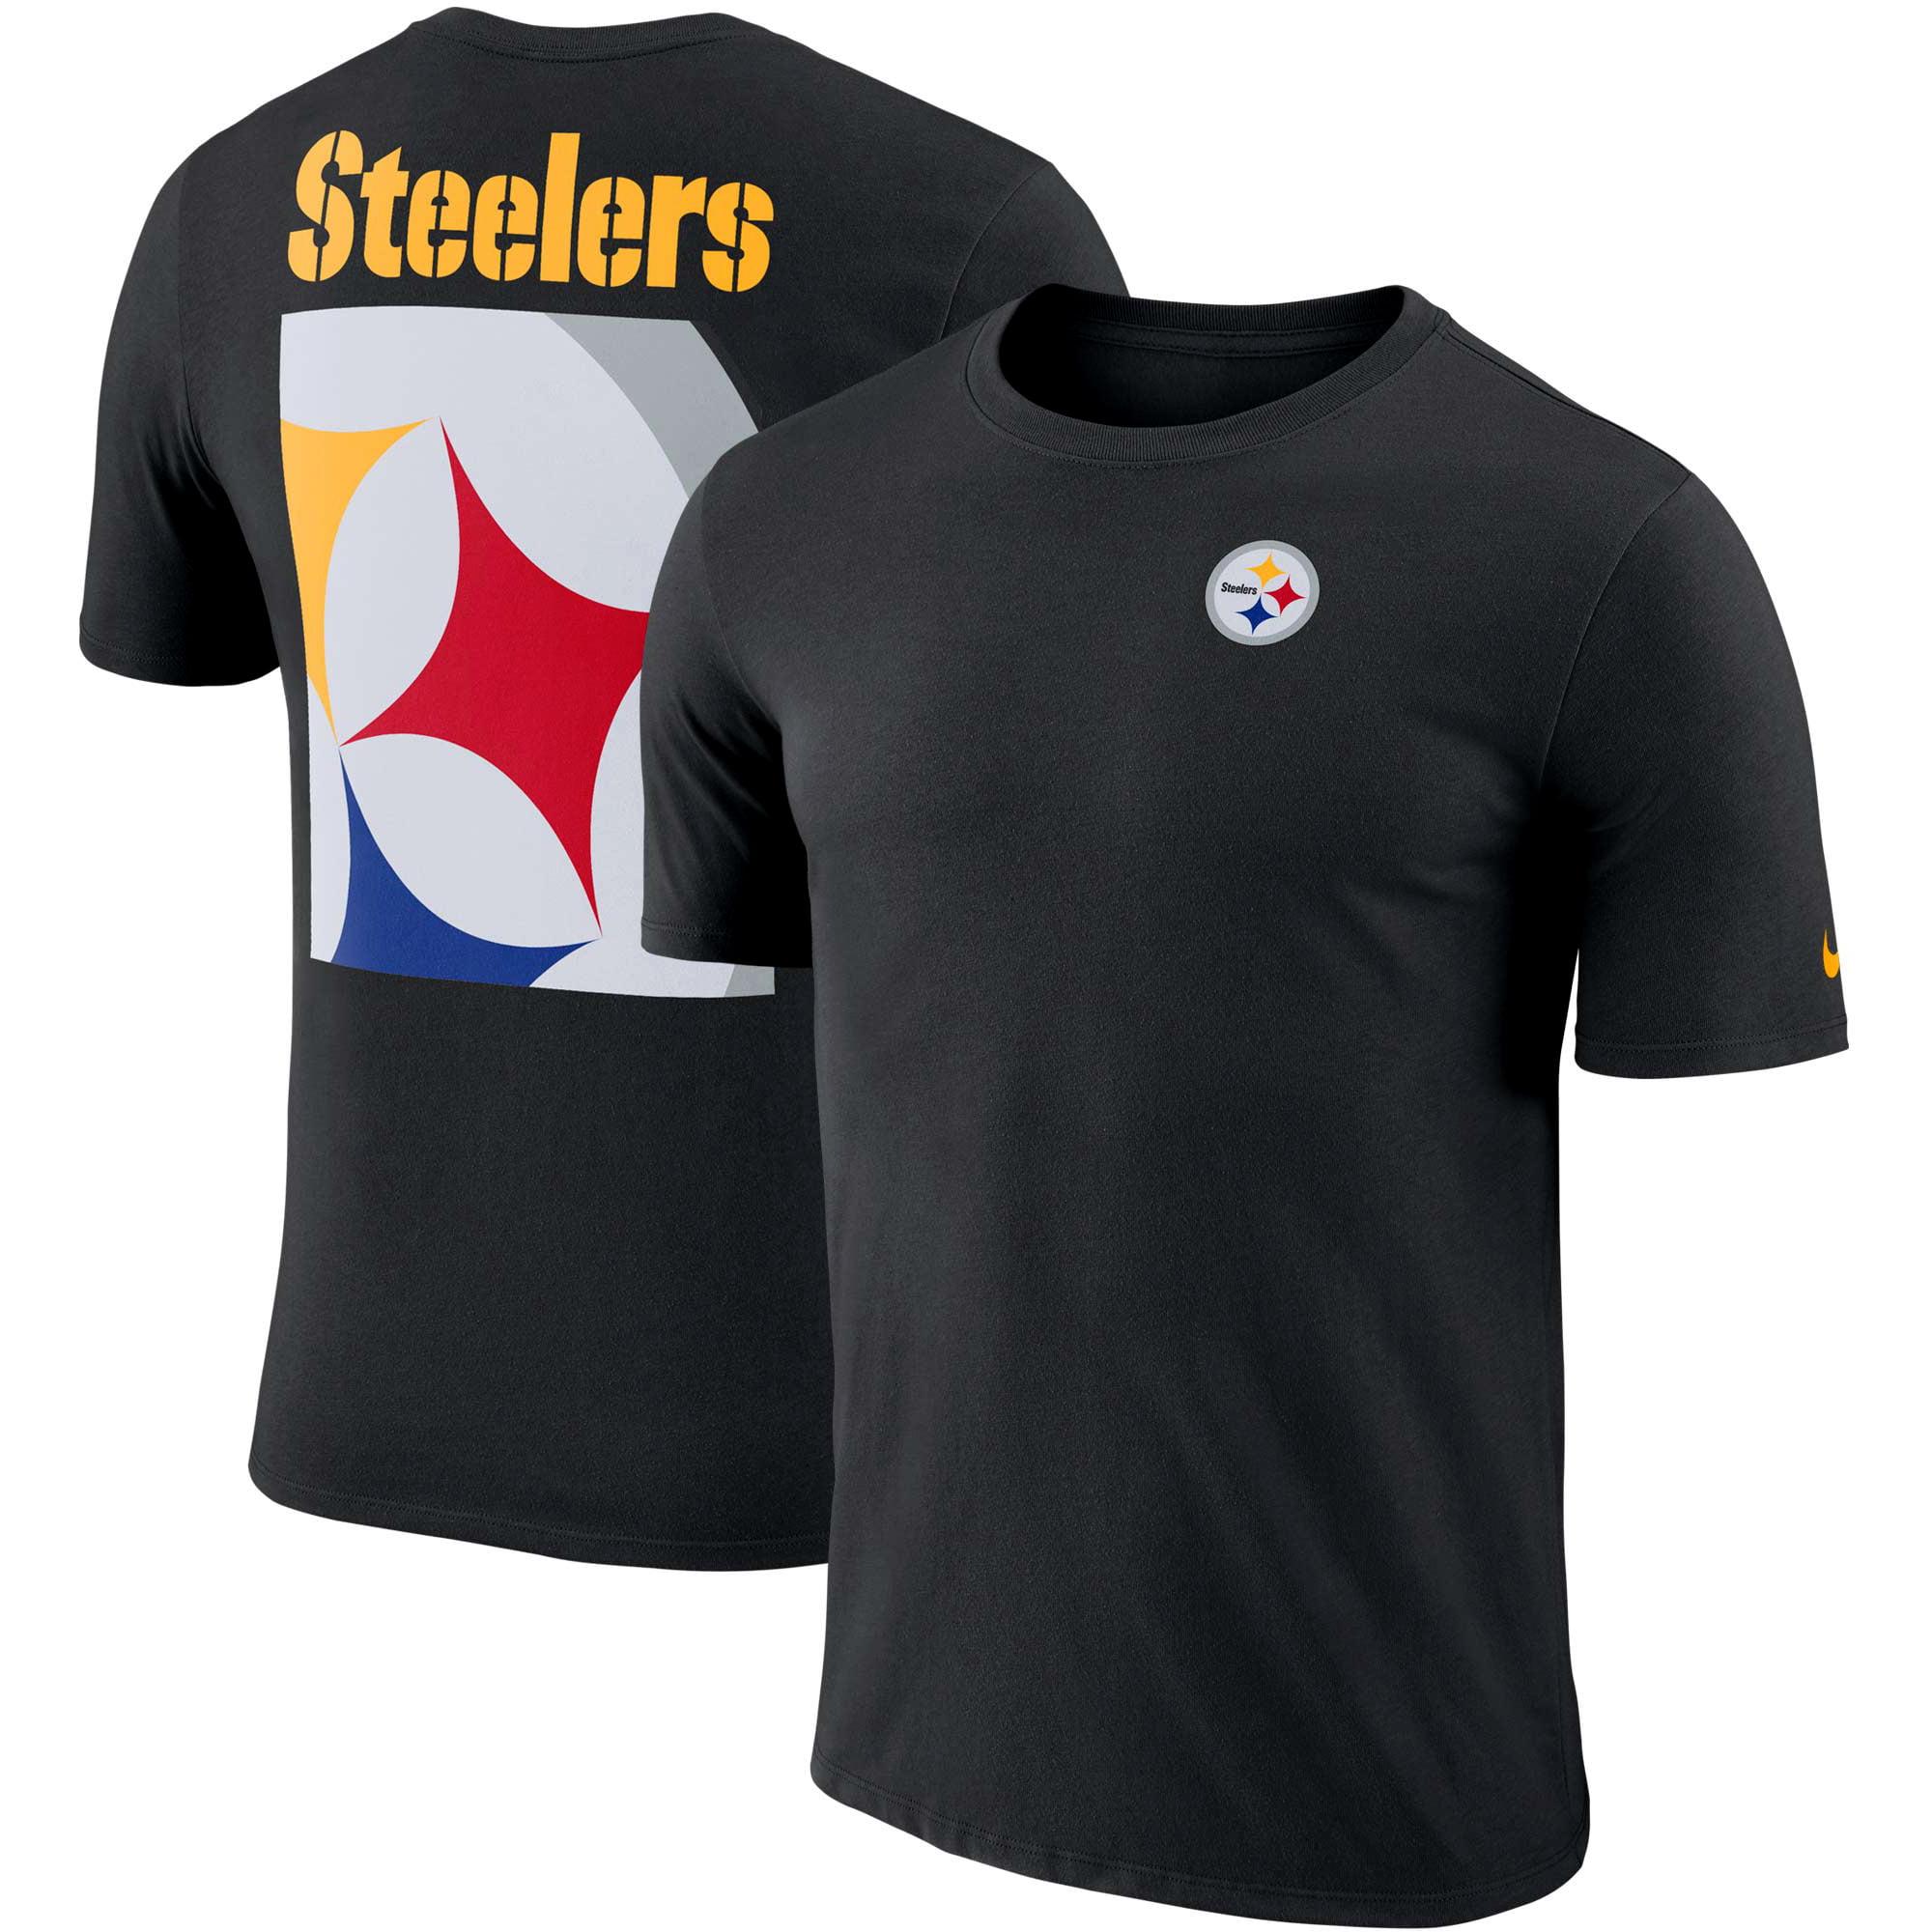 Pittsburgh Steelers Nike Performance Crew Champ T-Shirt - Black